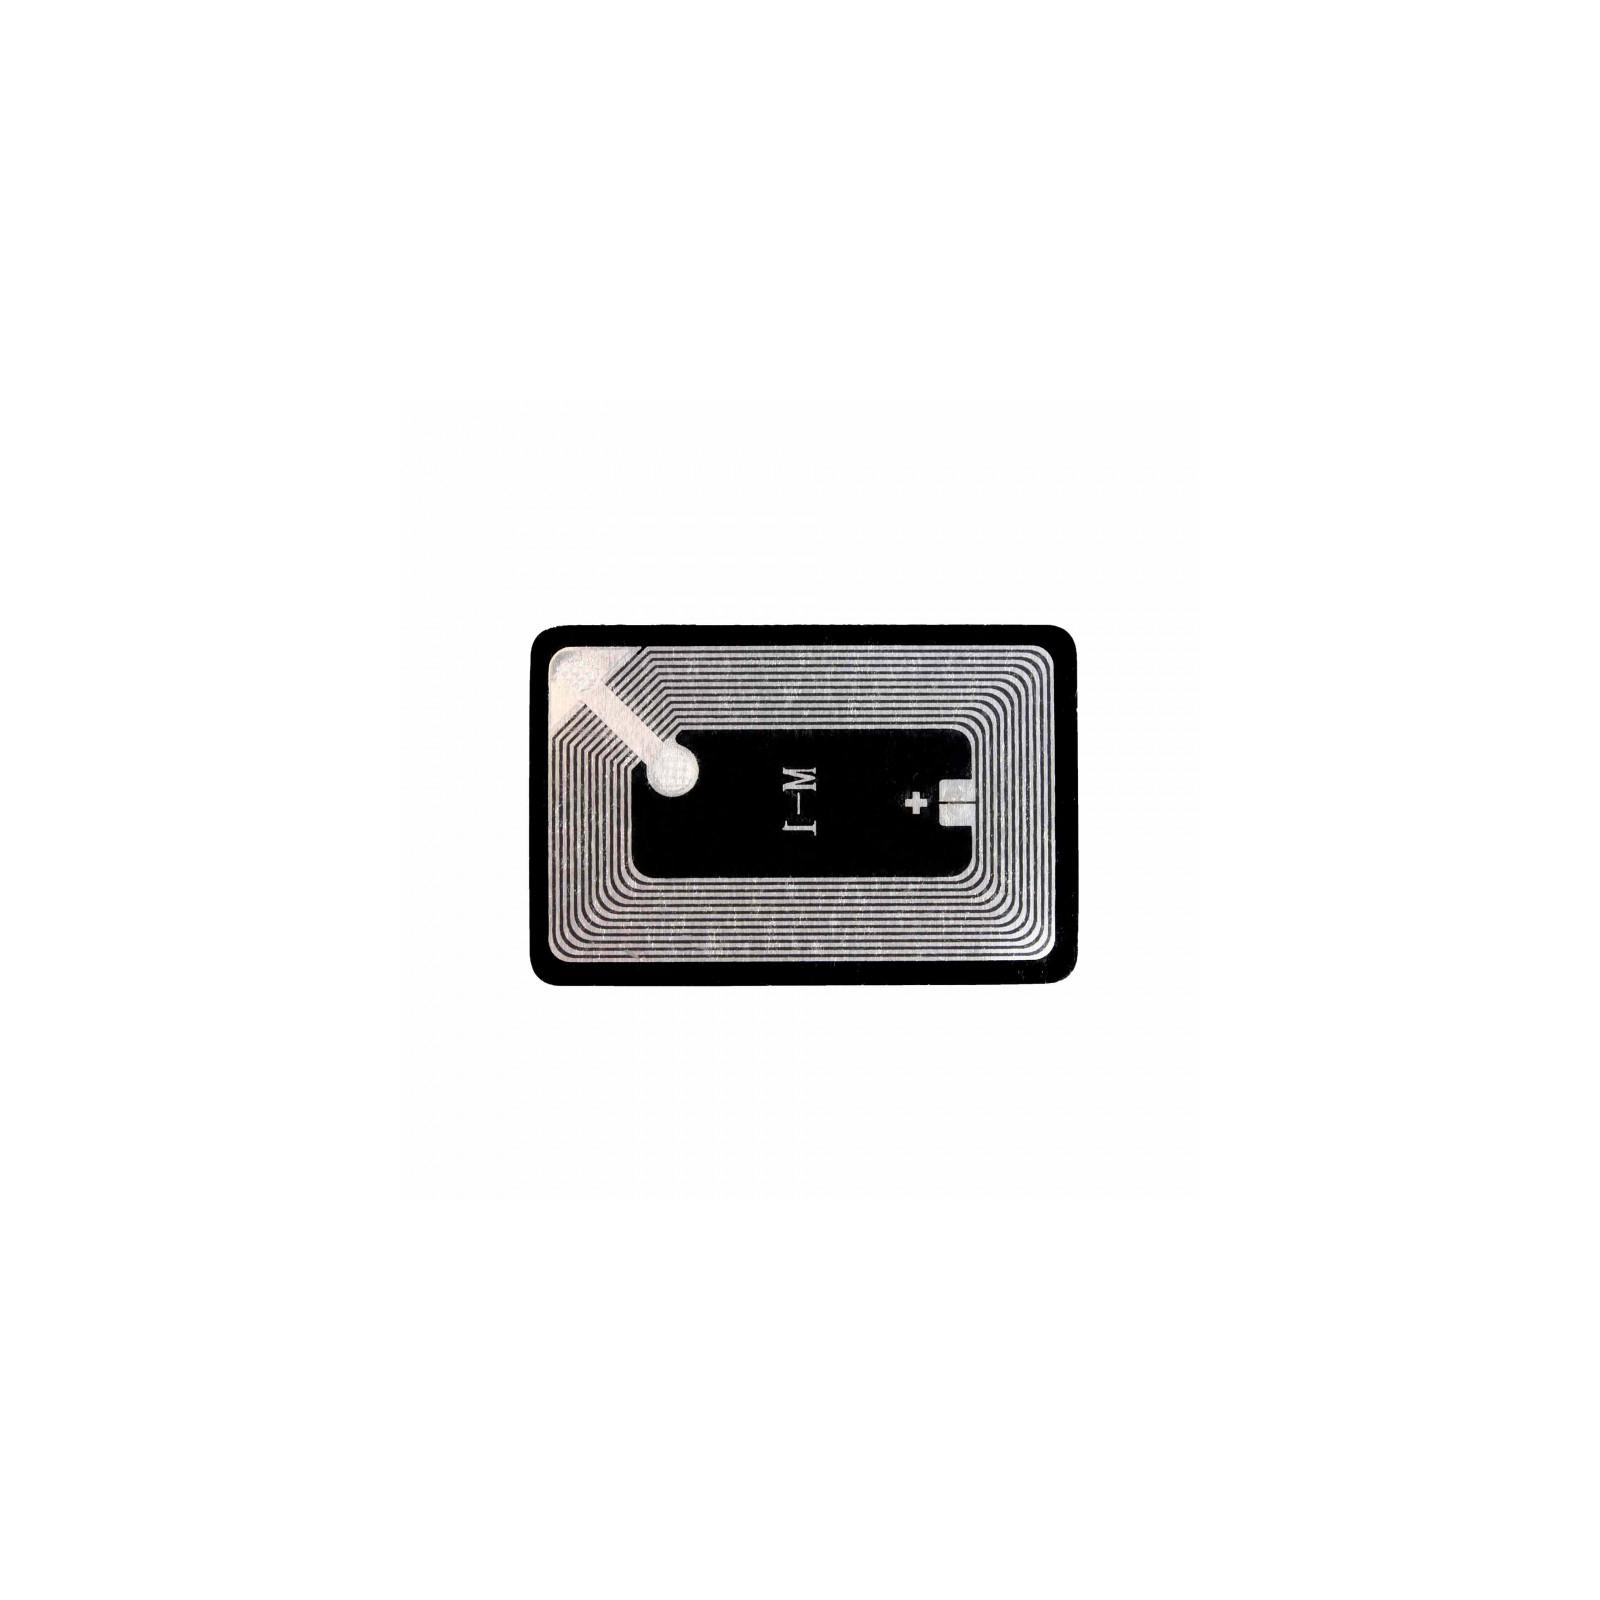 Чип для картриджа Kyocera TK-350 (EU/MEA) 15k Static Control (TK350CHIP-EU)